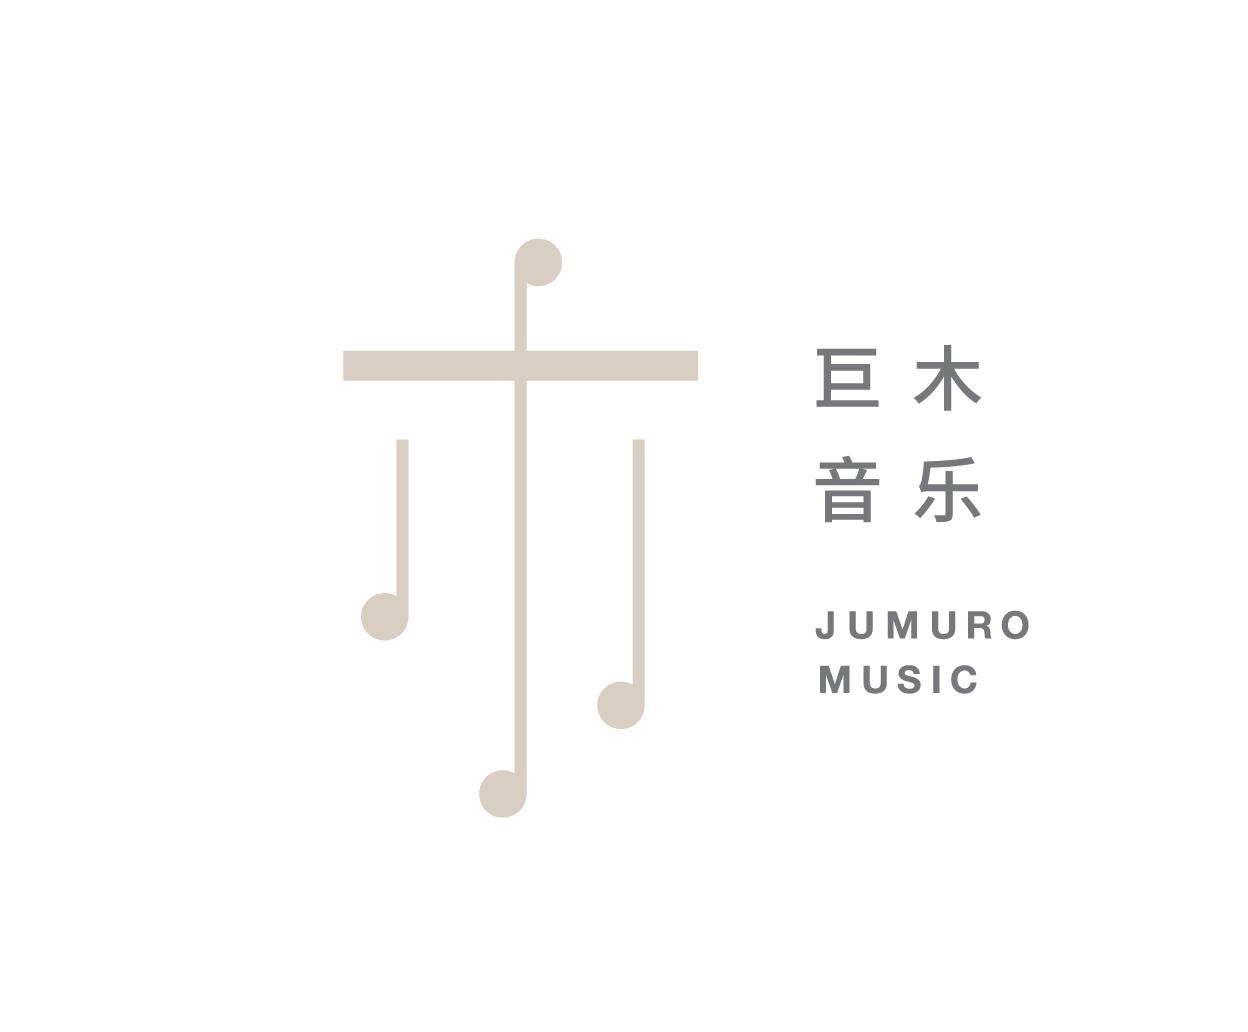 Jumuro Music